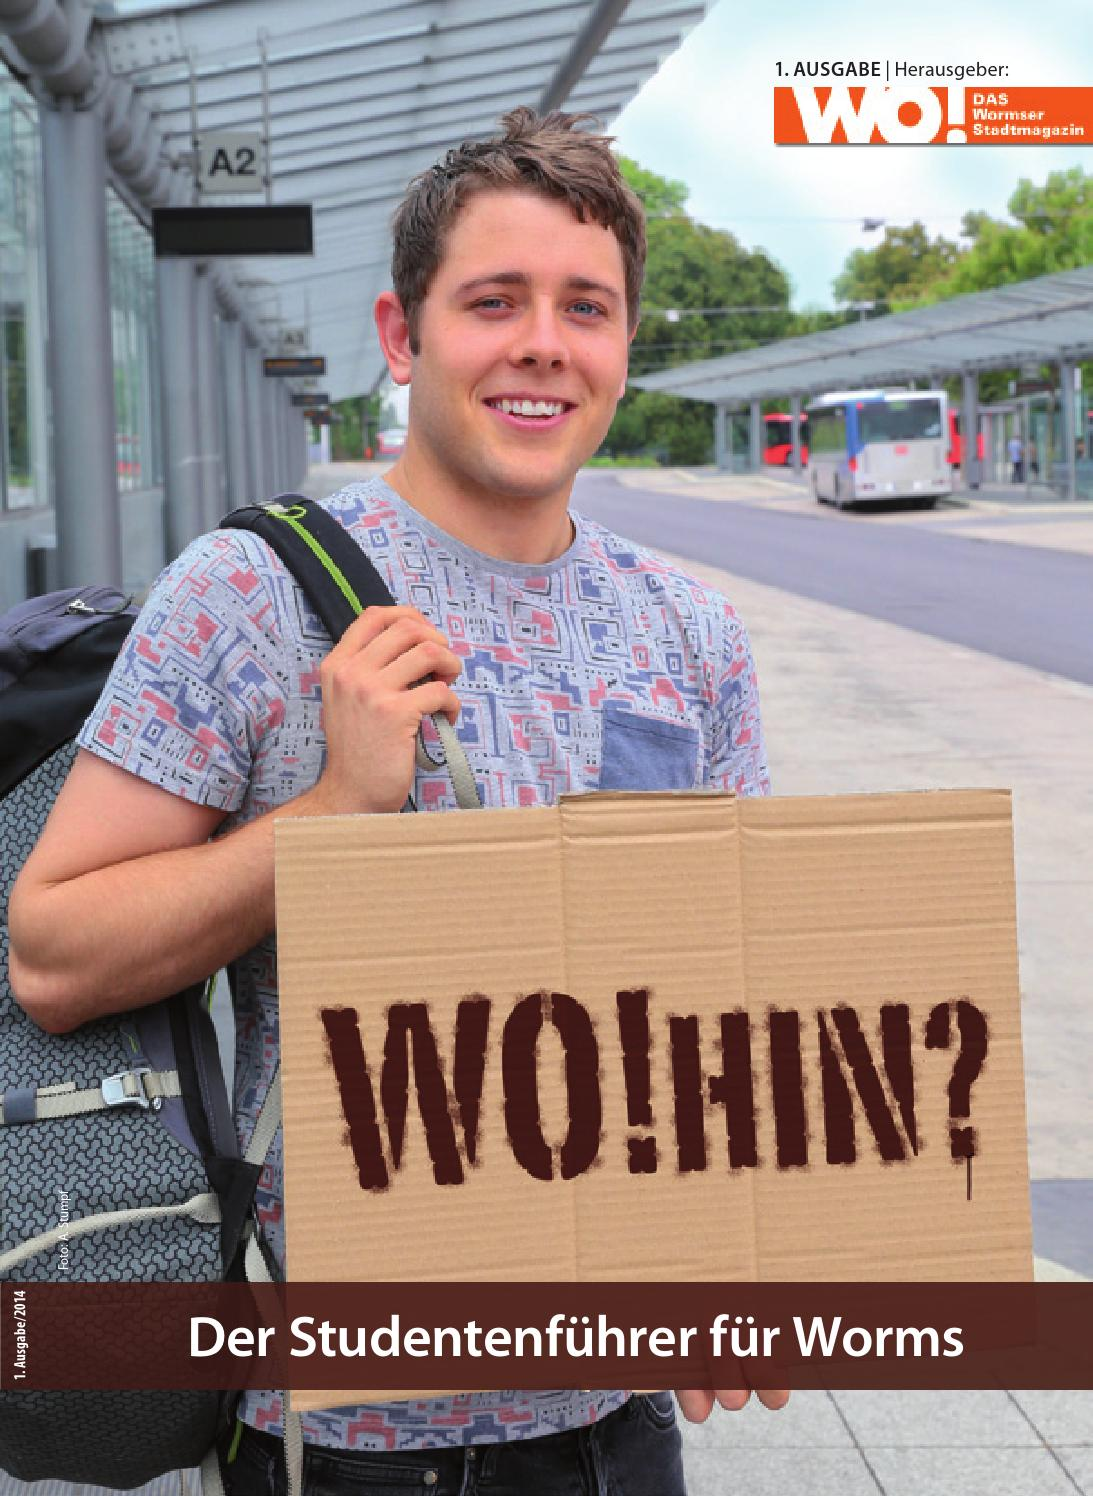 Wohin studifu¦êhrer web by WO! – DAS Wormser Stadtmagazin - issuu